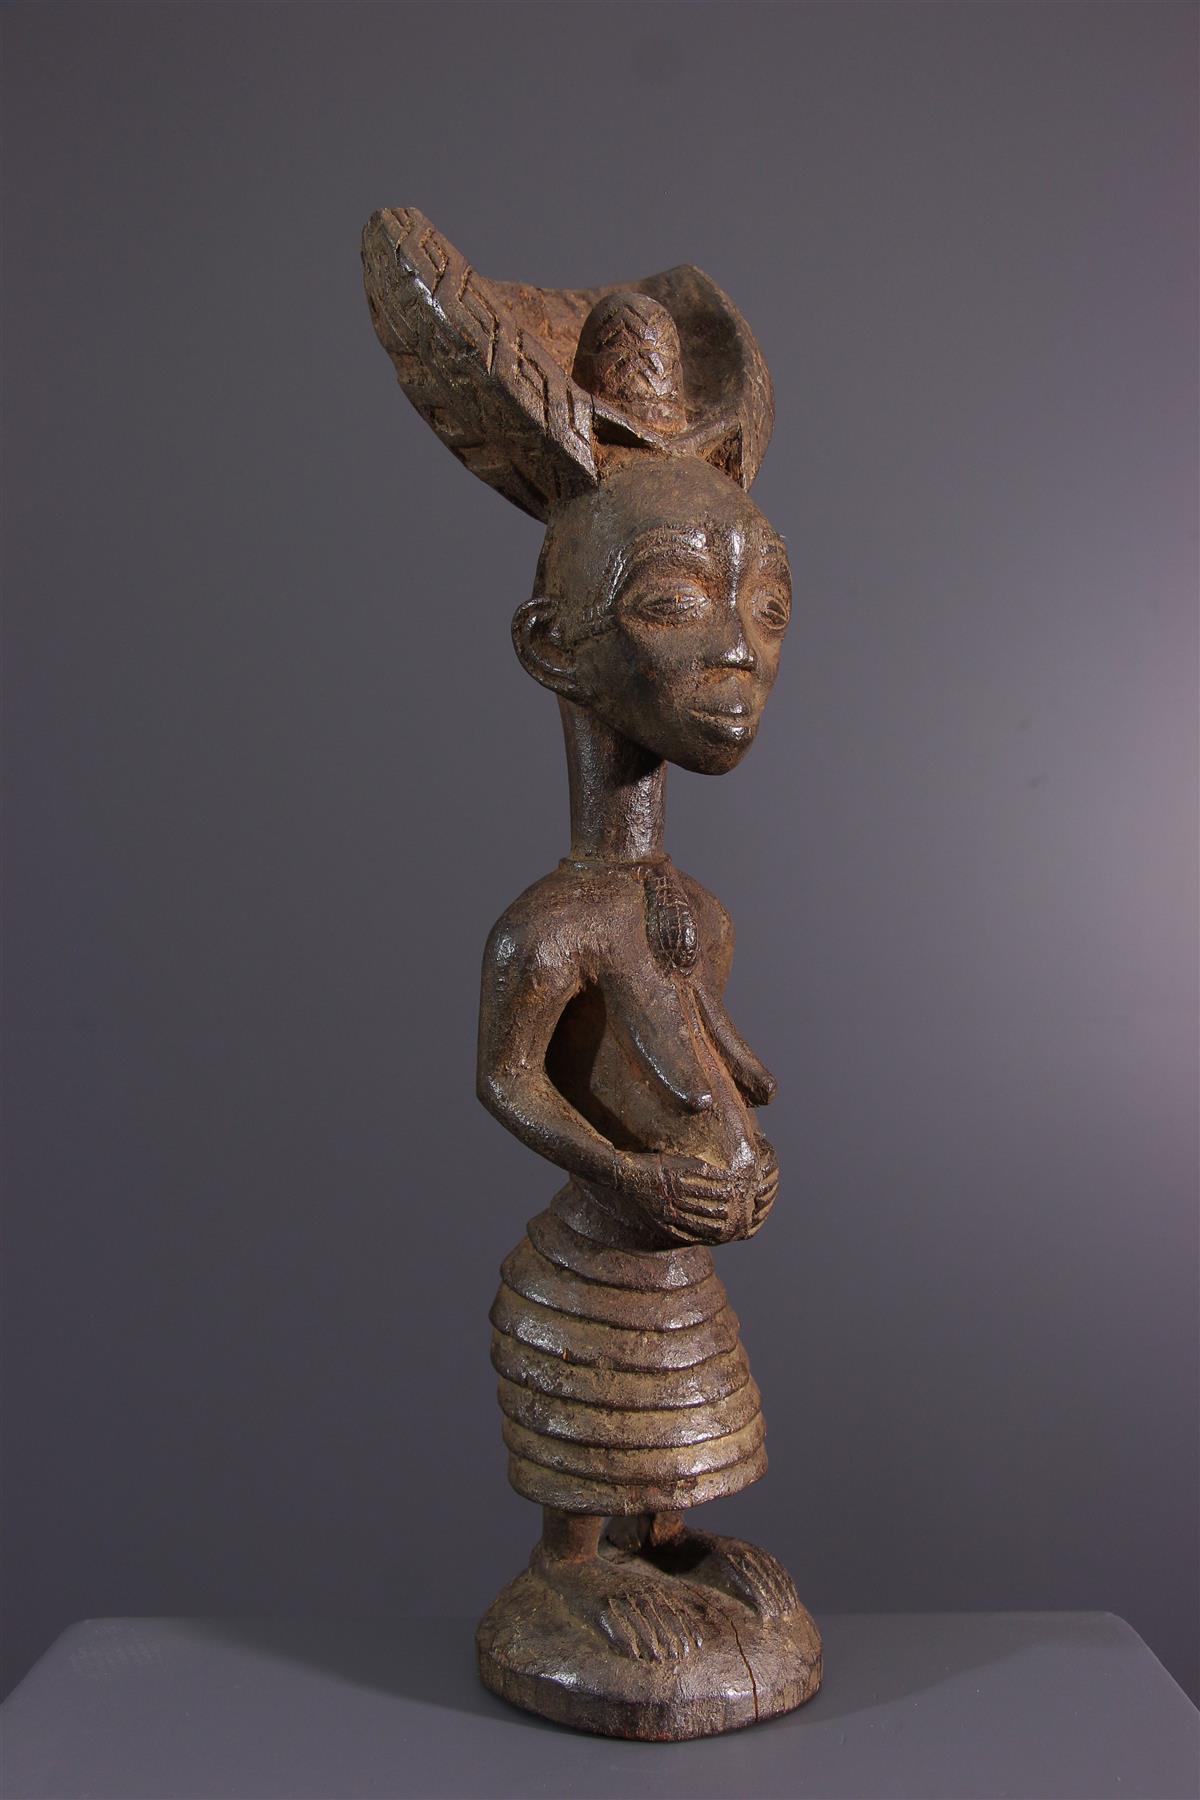 Statuette Cuba - African art